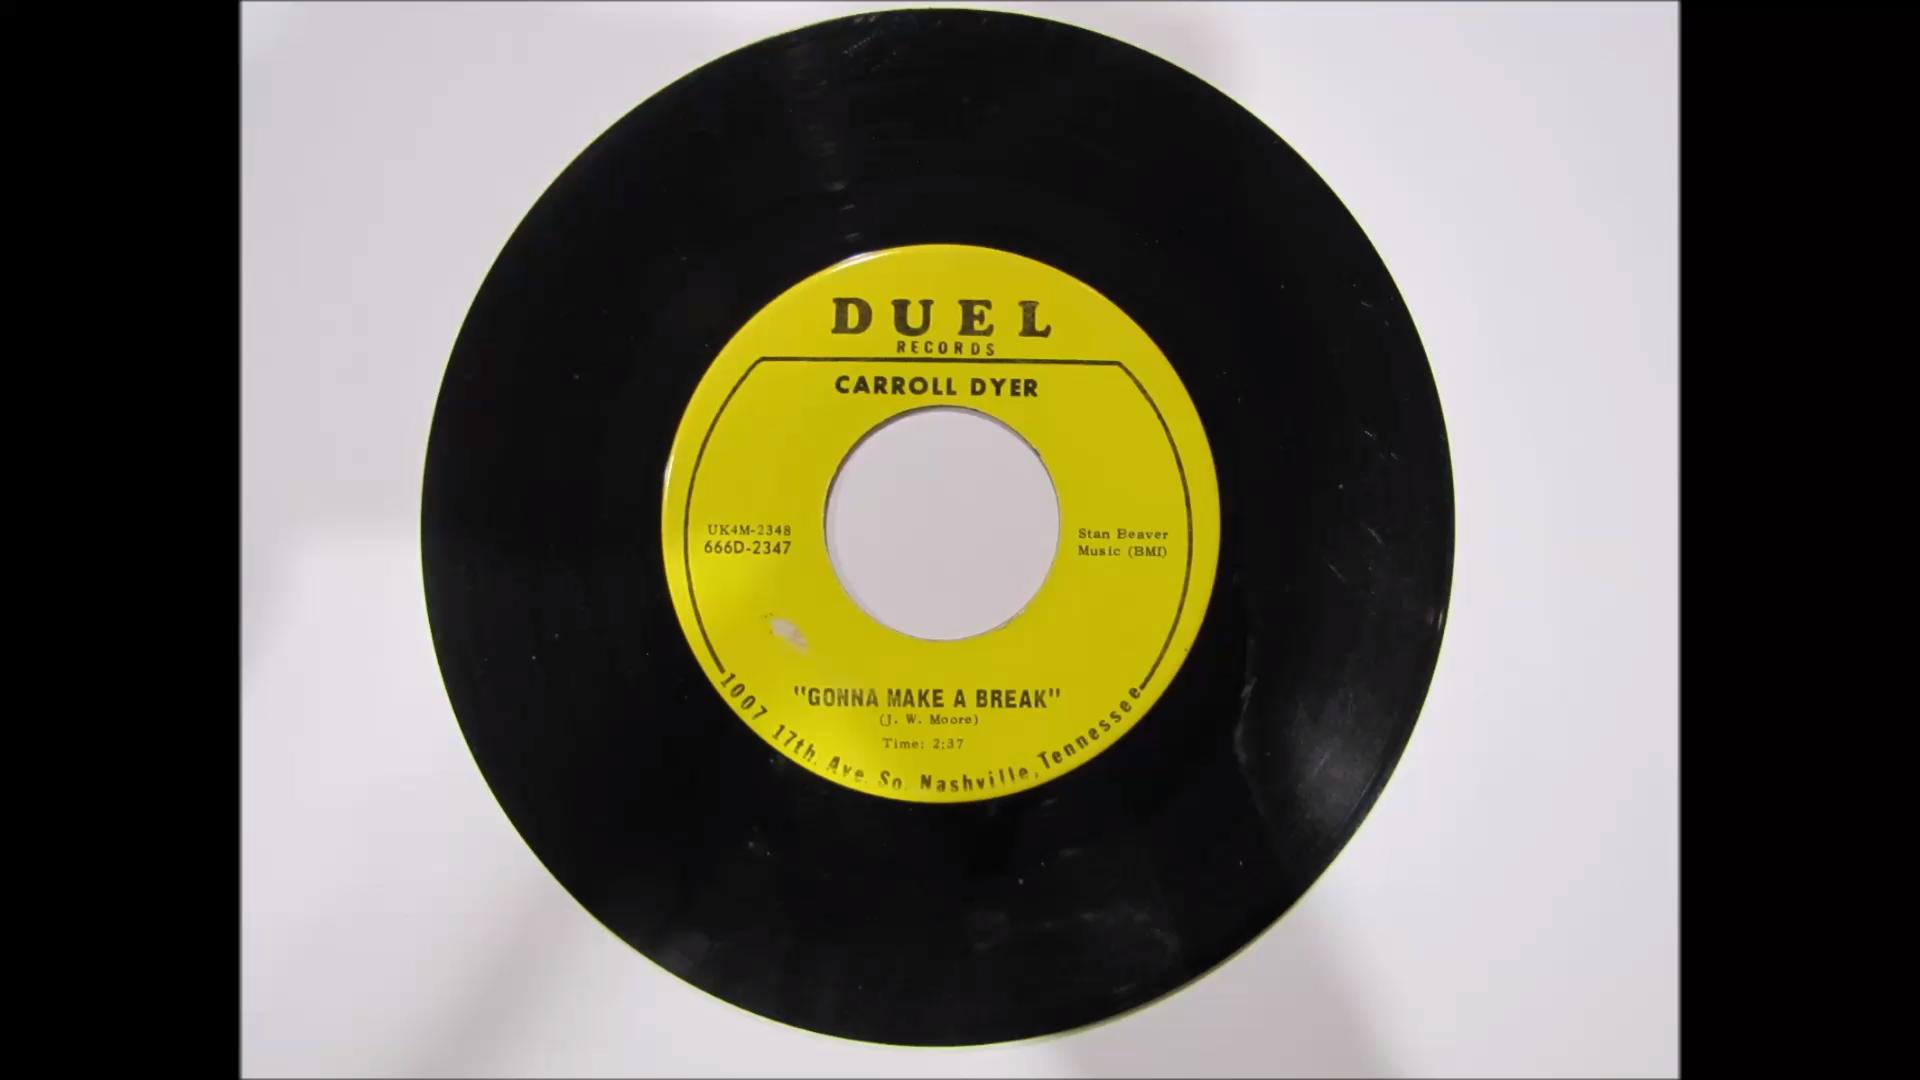 Carroll Dyer - Gonna Make A Break [1967]